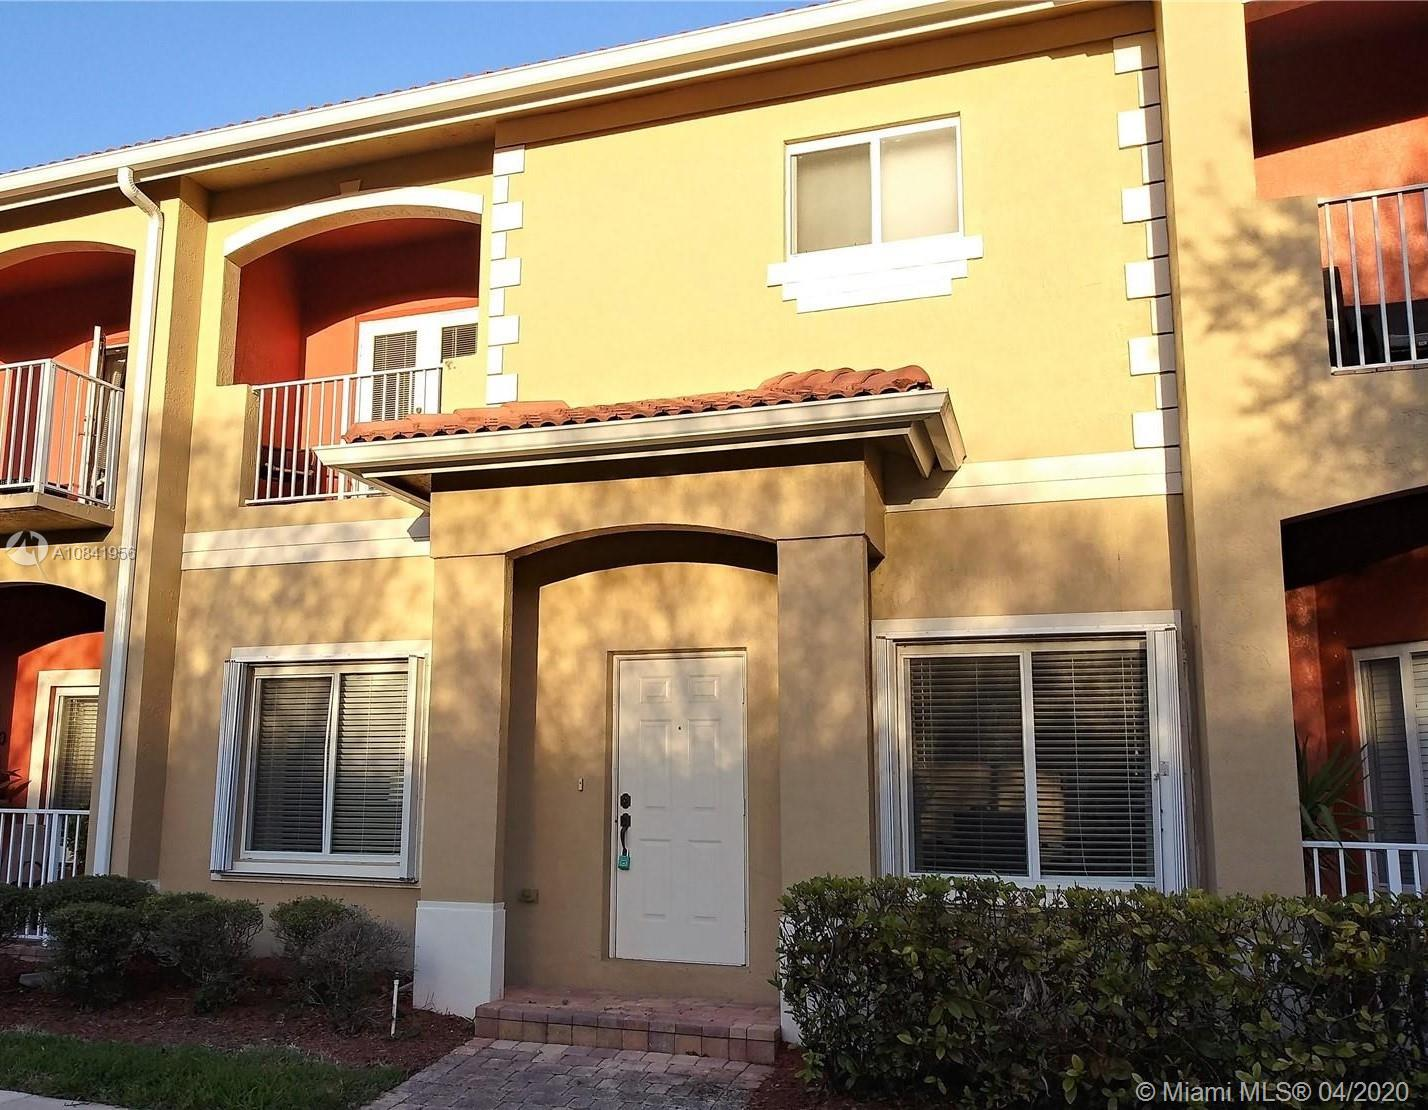 1964 SE 23 Rd, Homestead, FL 33035 - Homestead, FL real estate listing